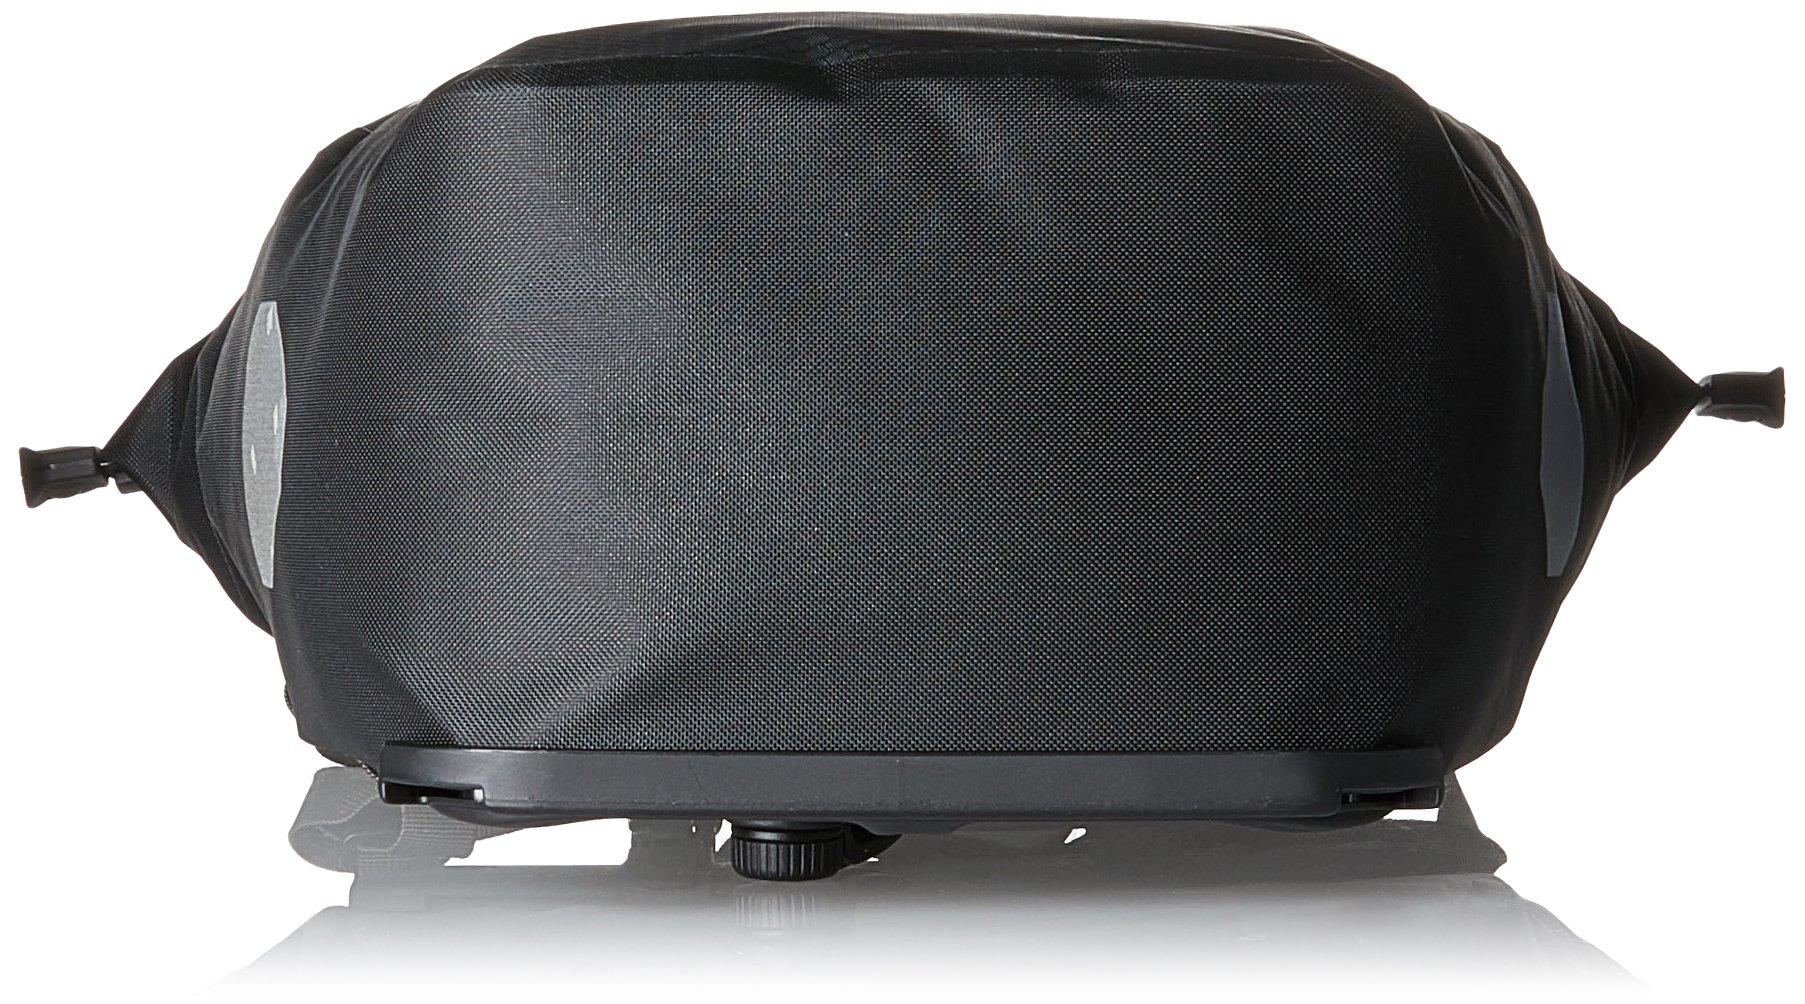 Ortlieb Bike Shopper Pannier: Each, QL2 Hardware, Slate/Black by Ortlieb (Image #4)